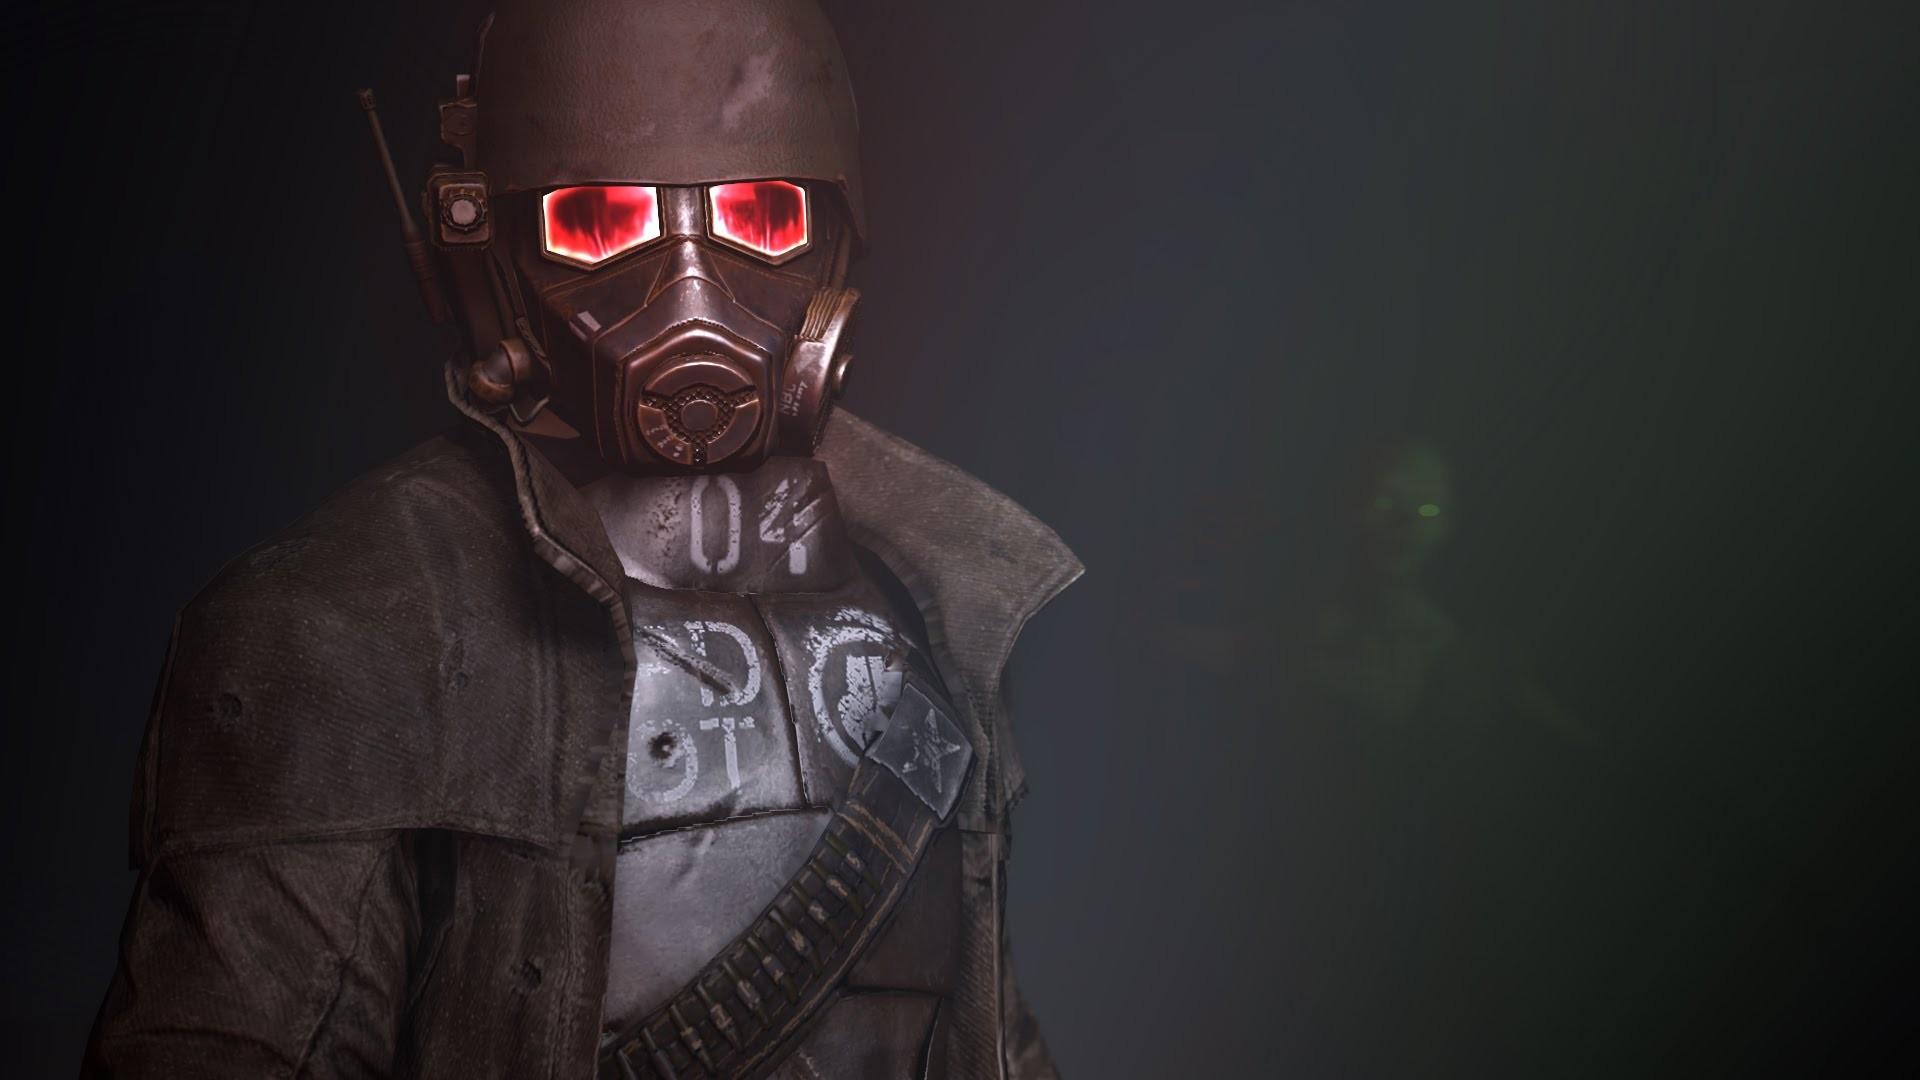 Fallout Ncr Ranger Wallpaper Wallpapertag